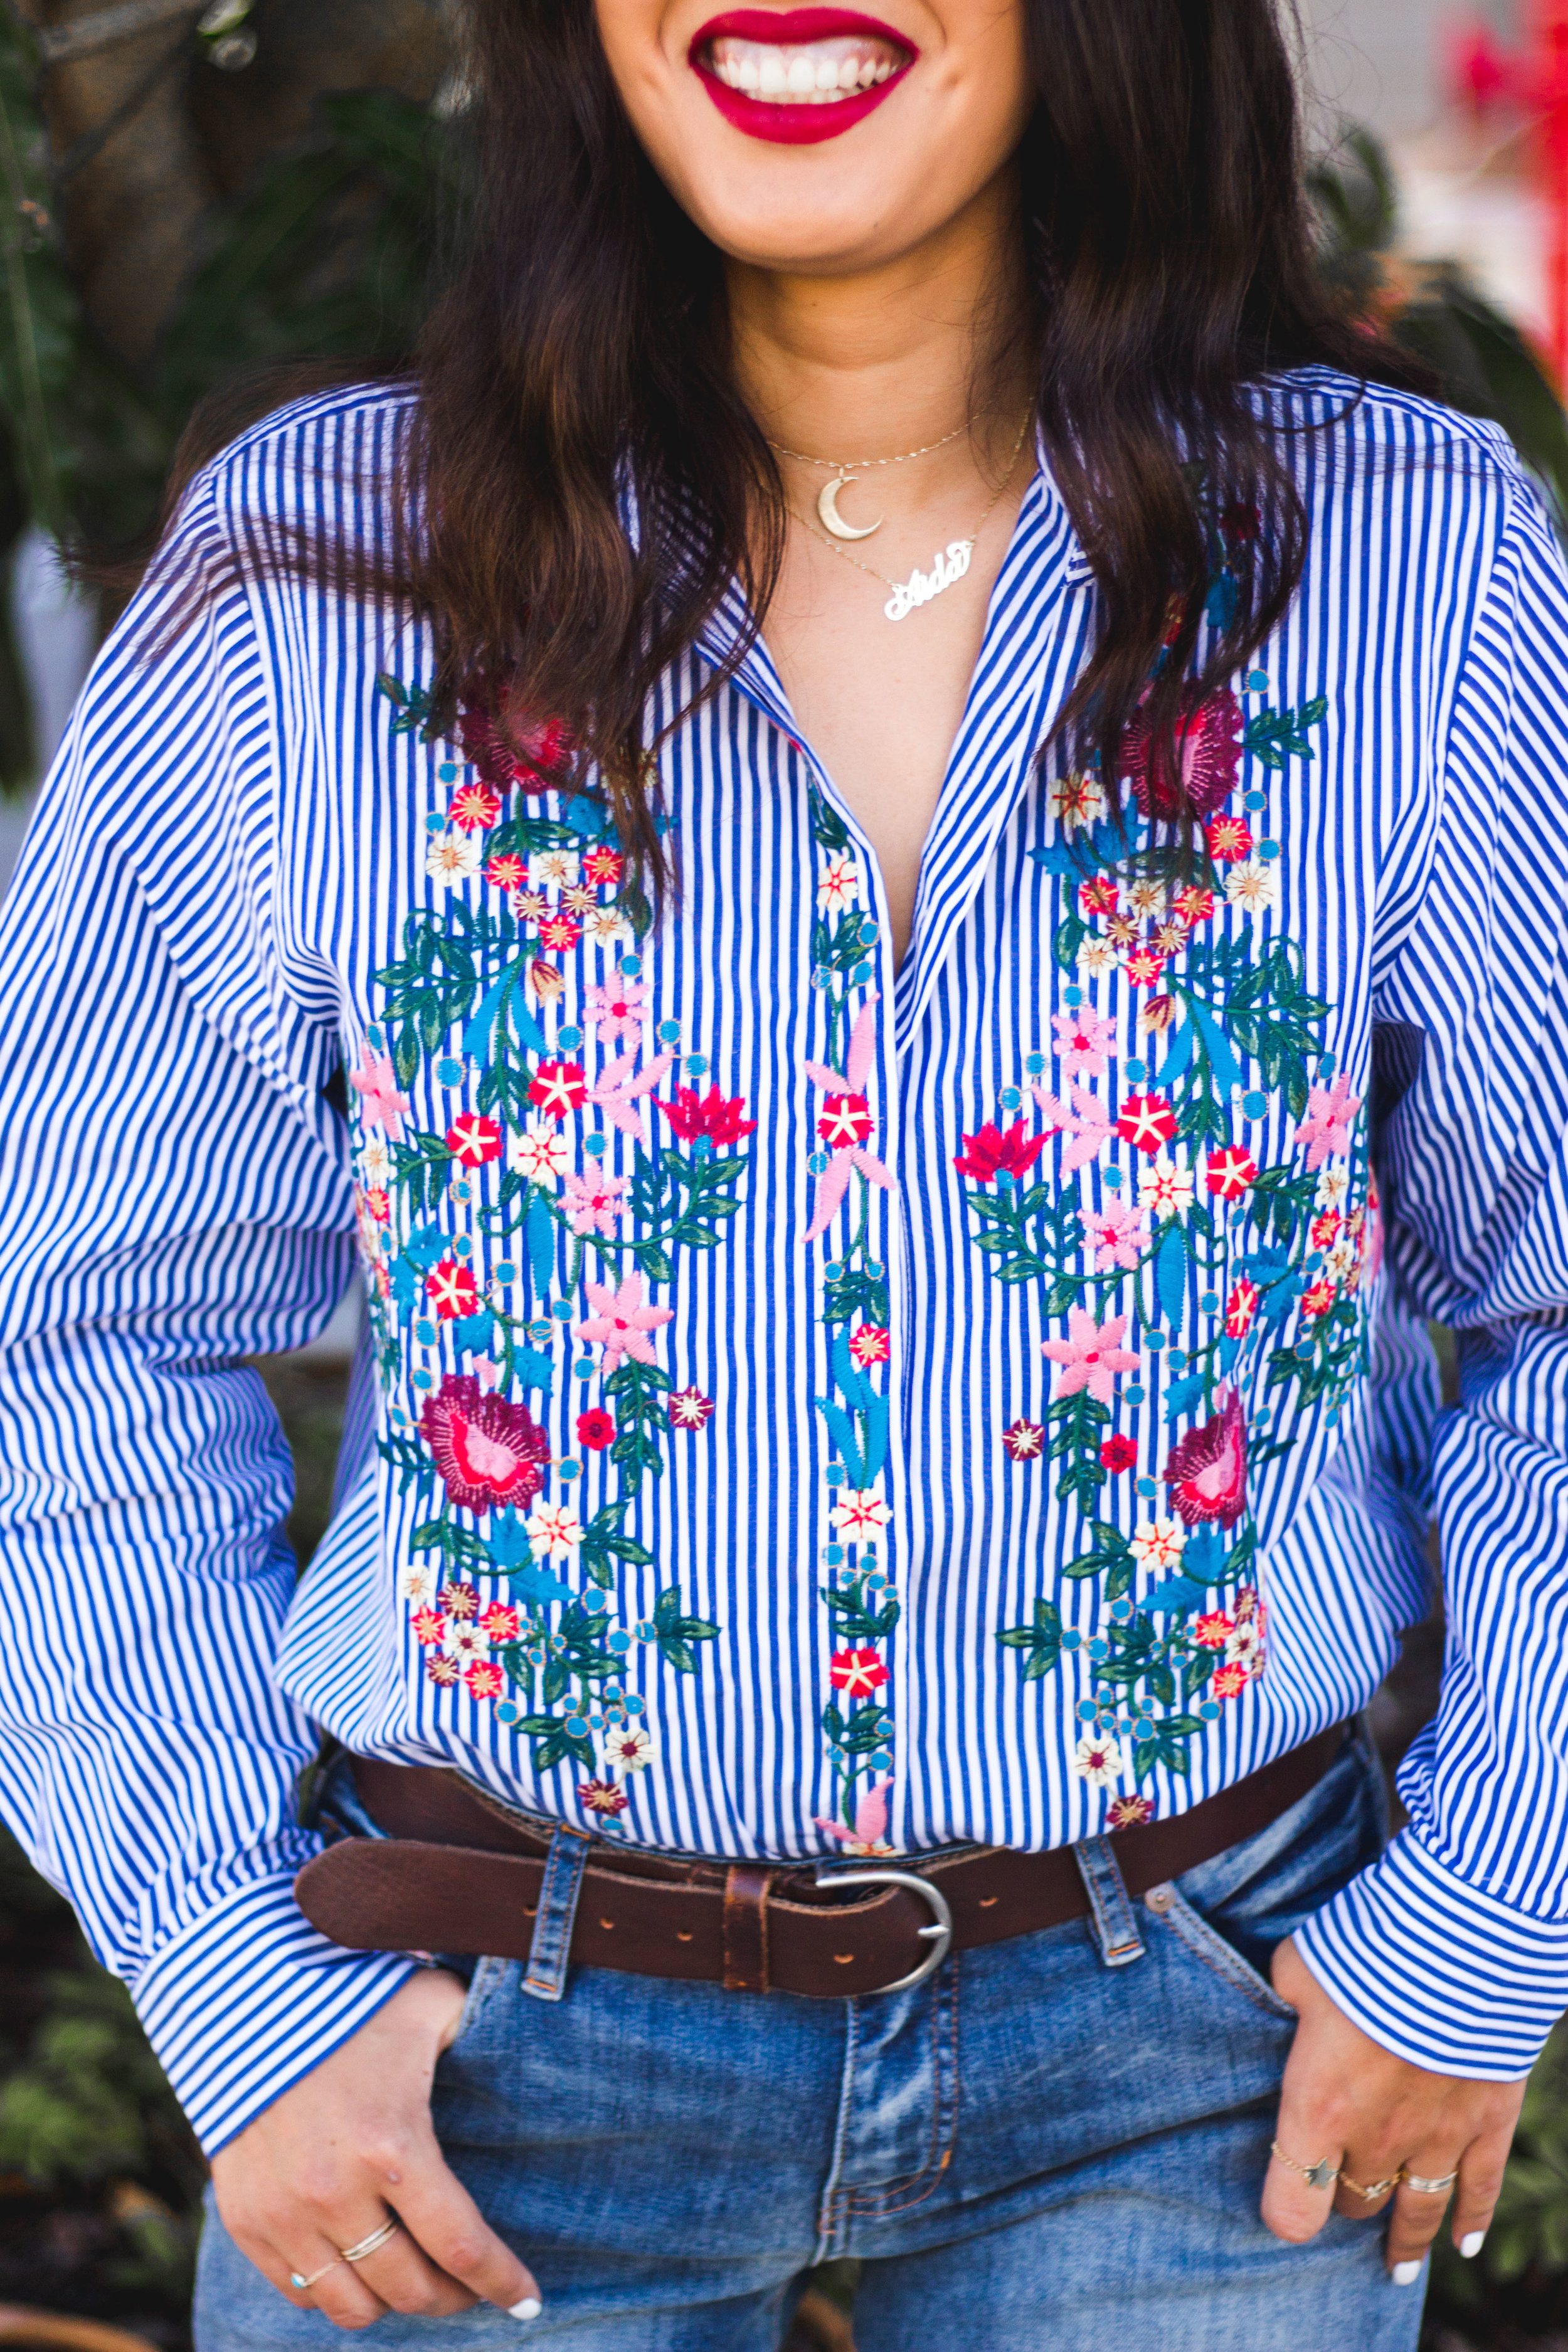 orlando-fashion-blogger-floral-print